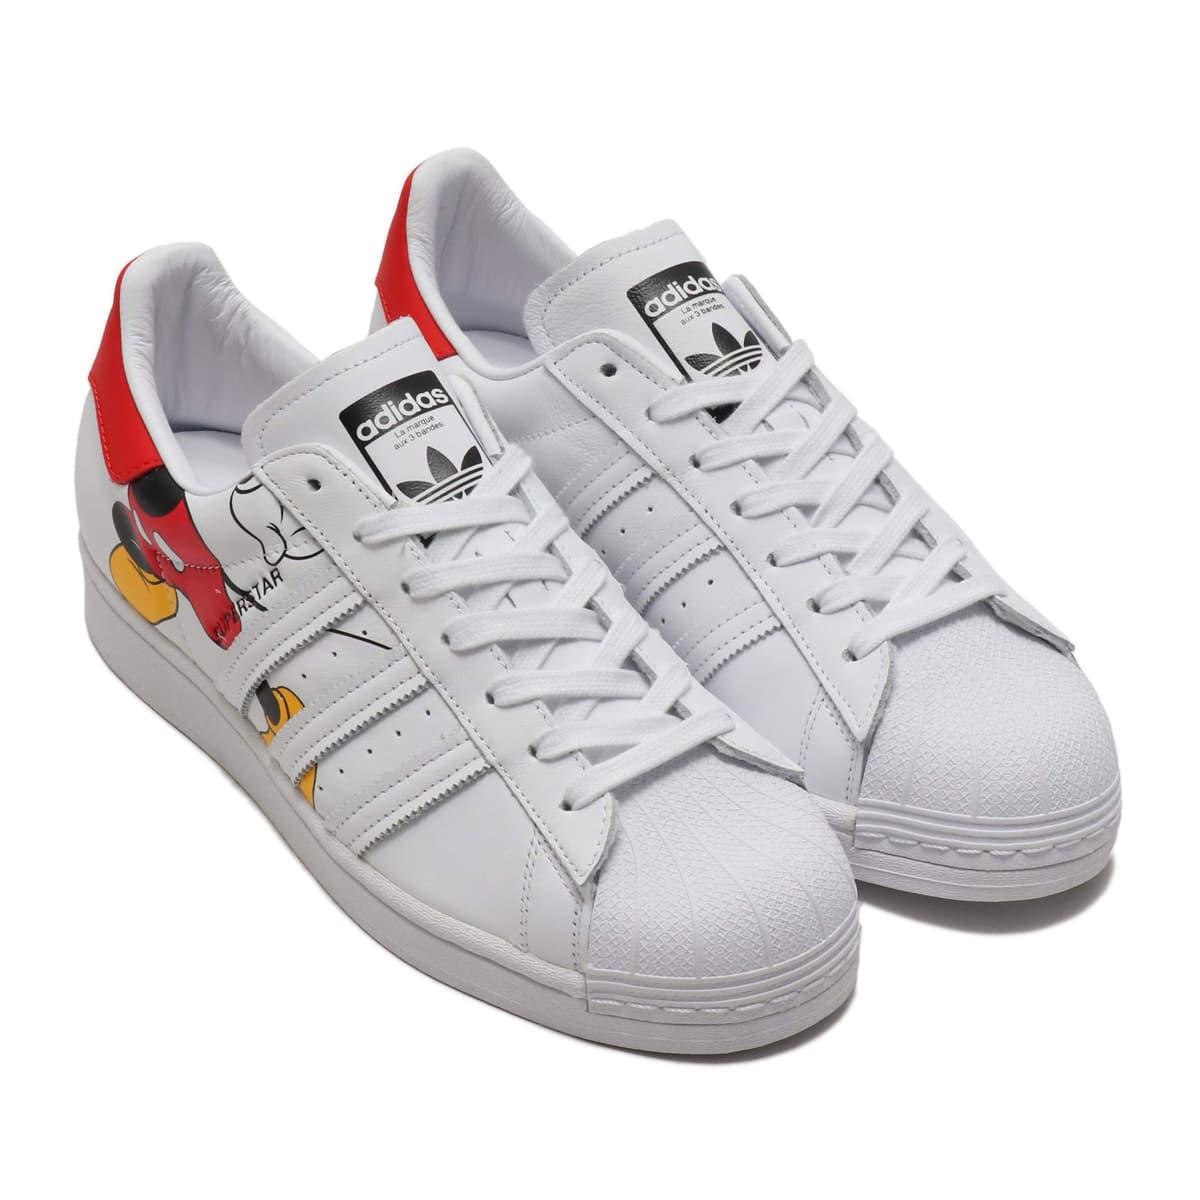 adidas SUPERSTAR FOOTWEAR WHITE/FOOTWEAR WHITE/CORE BLACK 20SS-S_photo_large